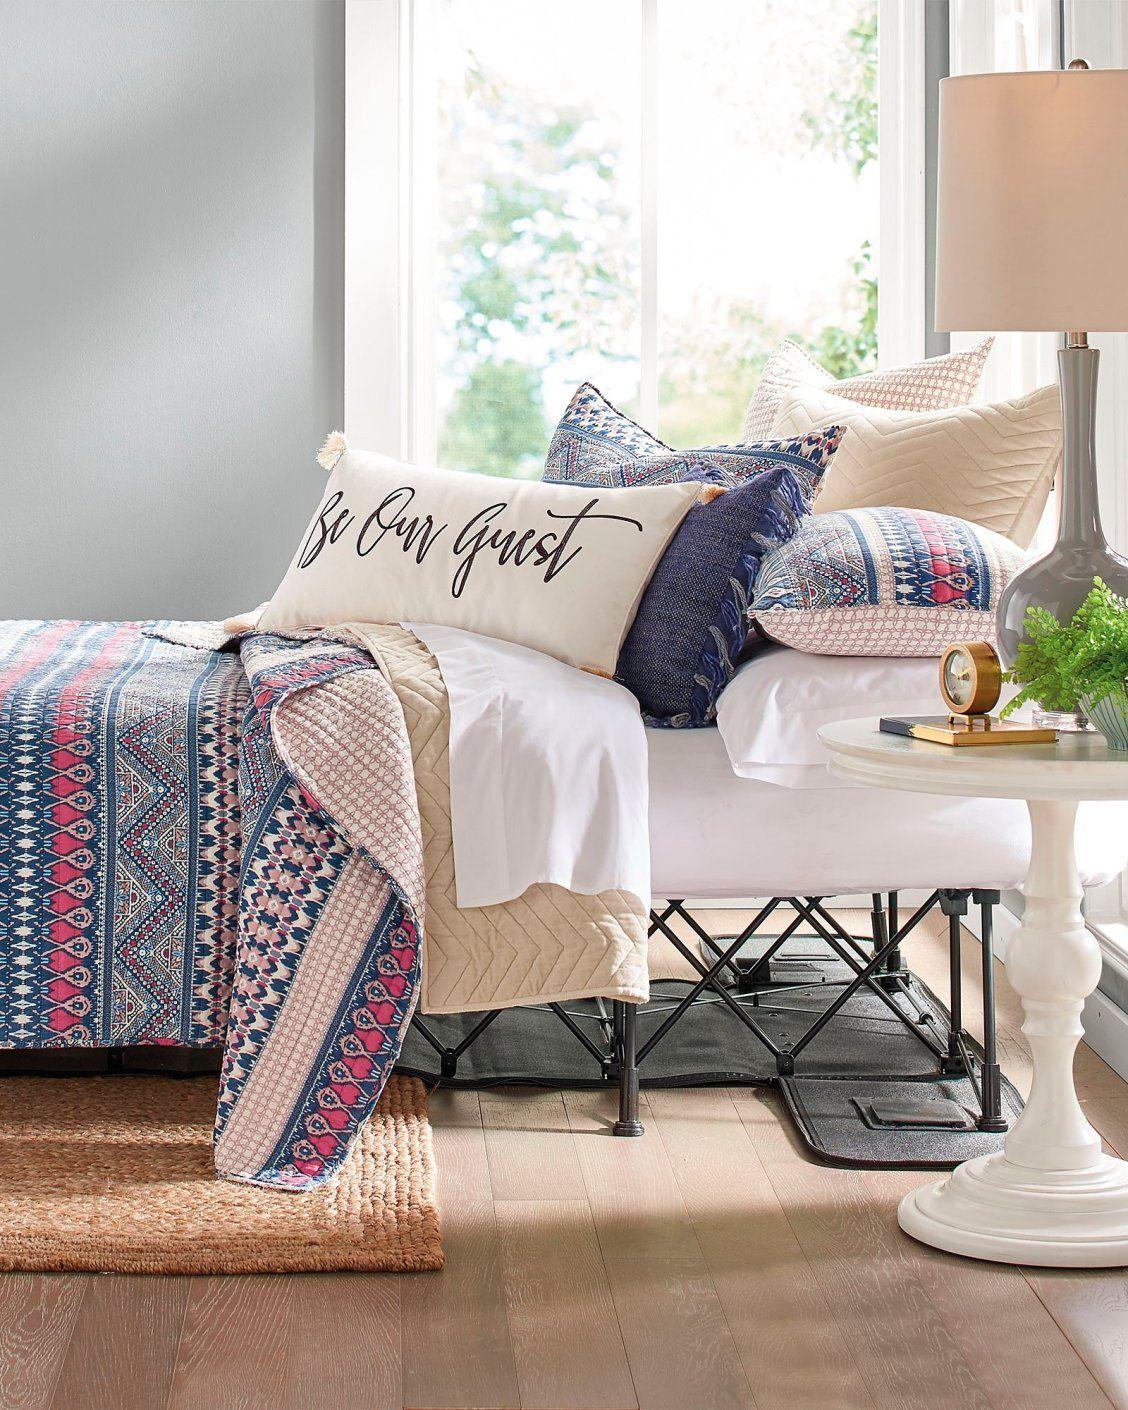 Ez bed in do pinterest bed bedroom and room